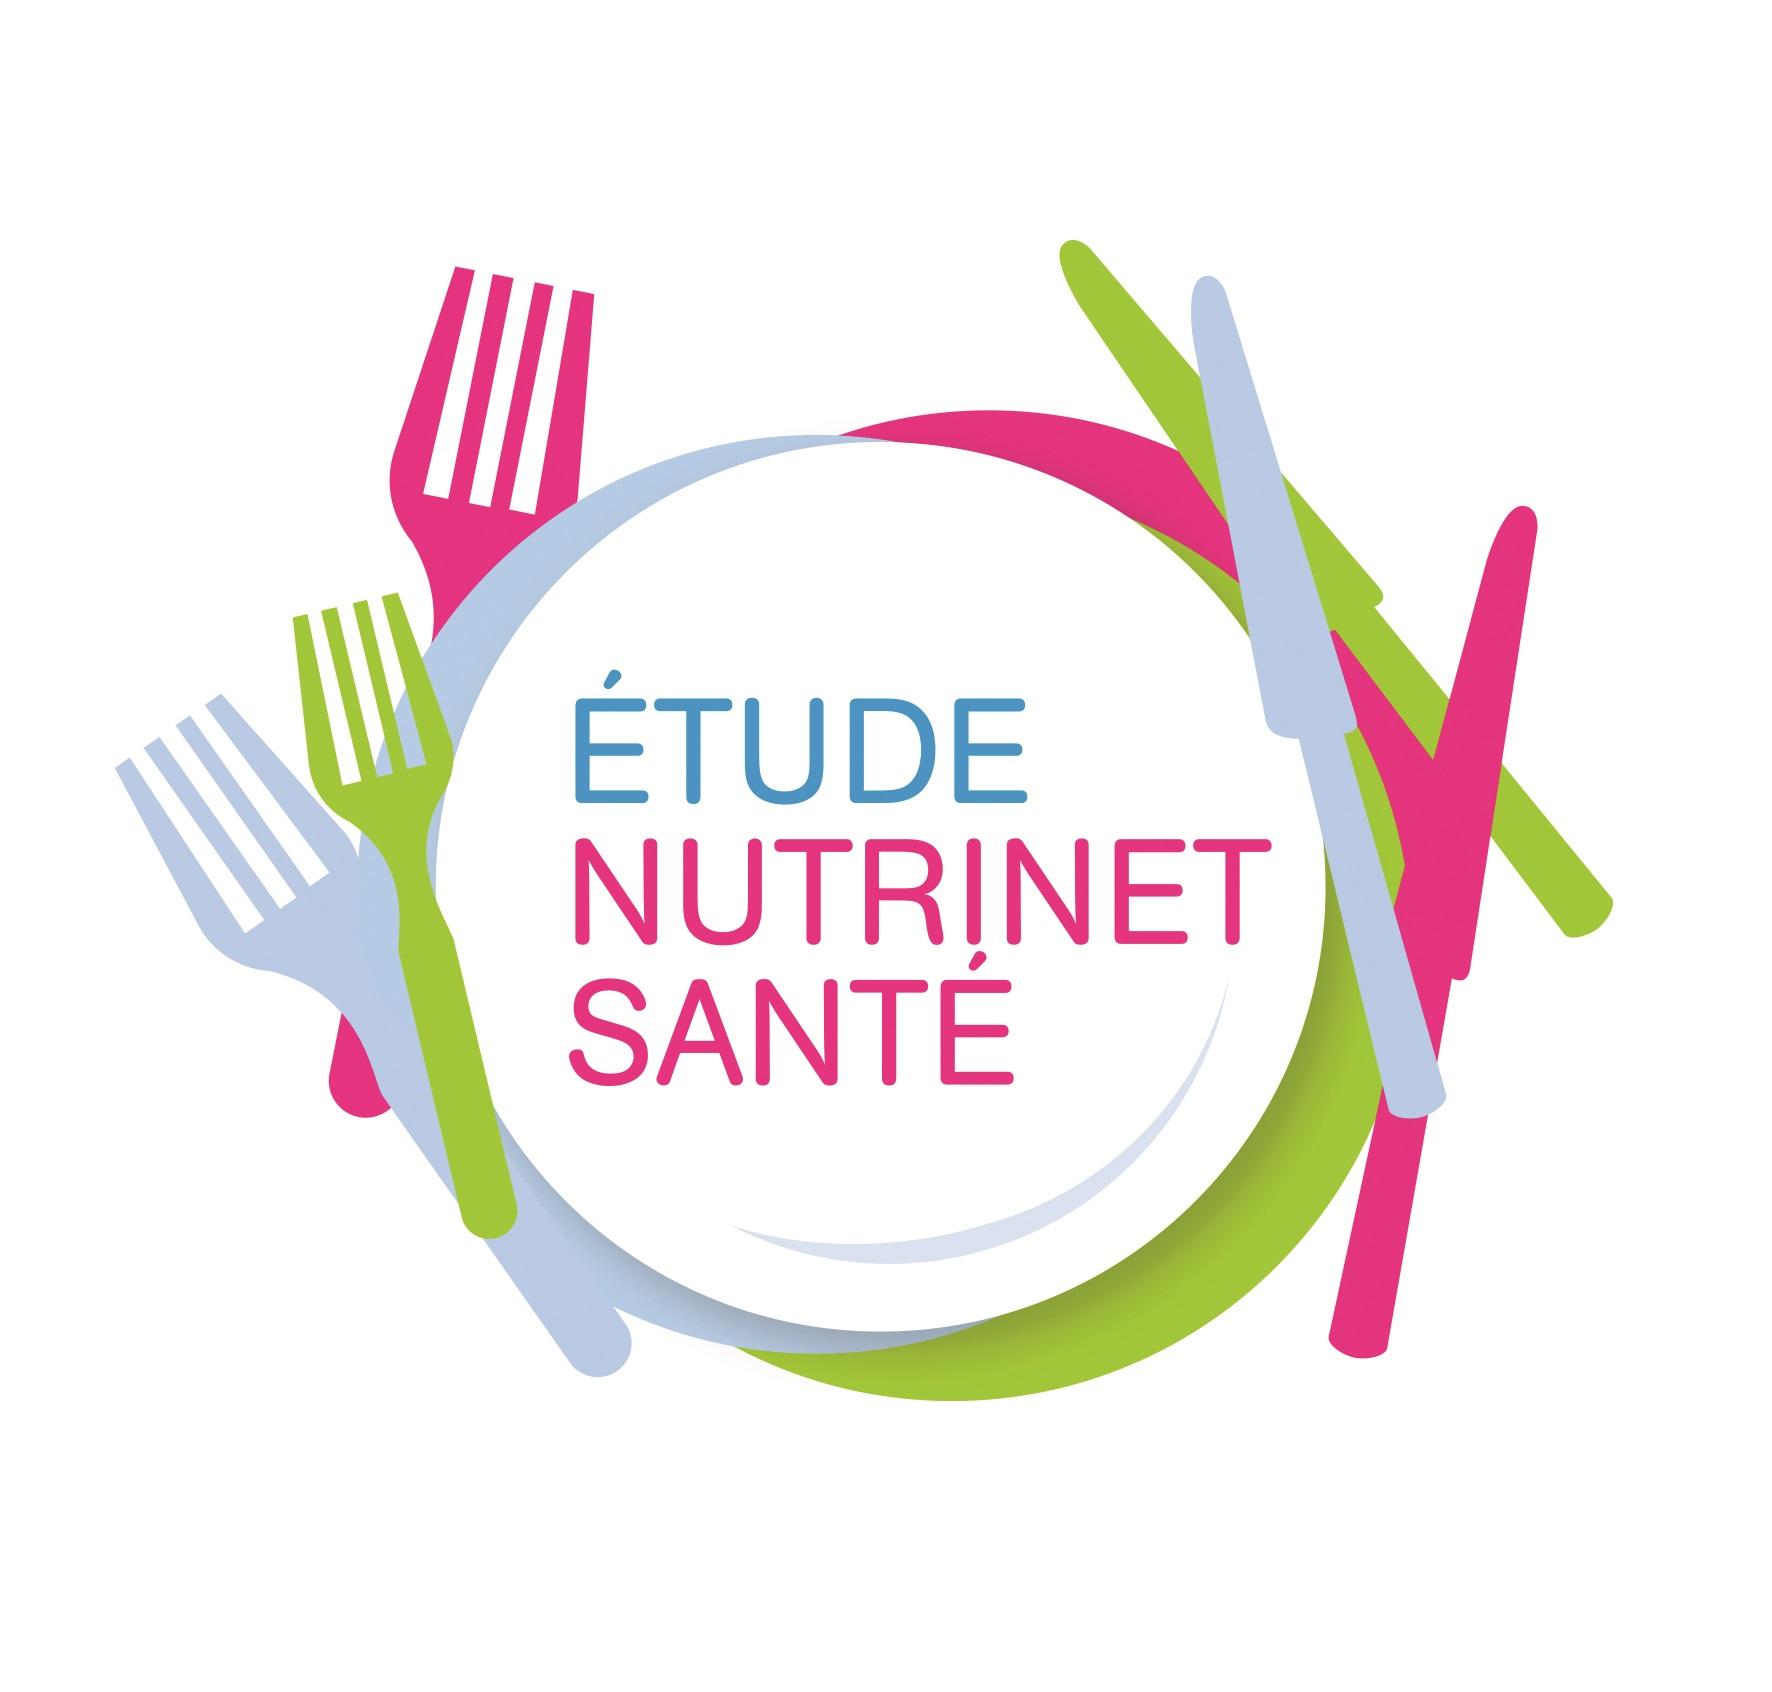 Etude NutriNet Santé